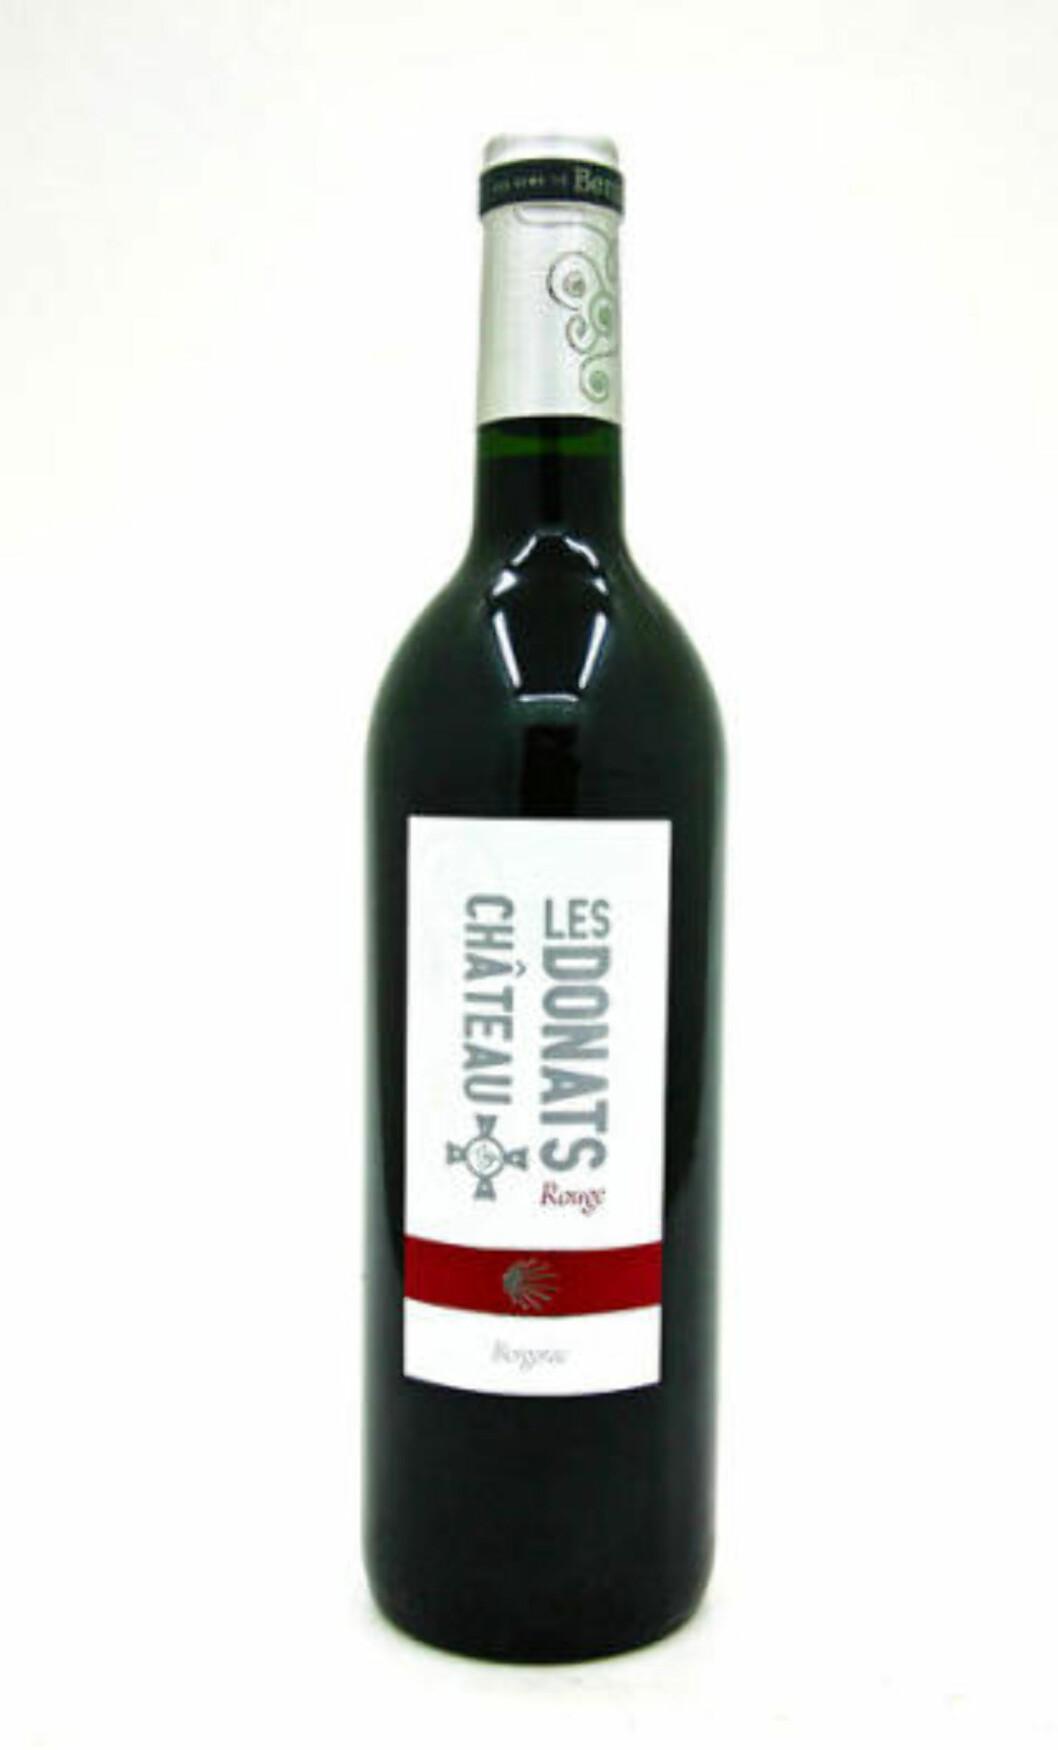 <strong>FRANSK SEKSER:</strong> Château les Donats fra Bergerac koster 104,90 og er en herlig vin til vårens lam.